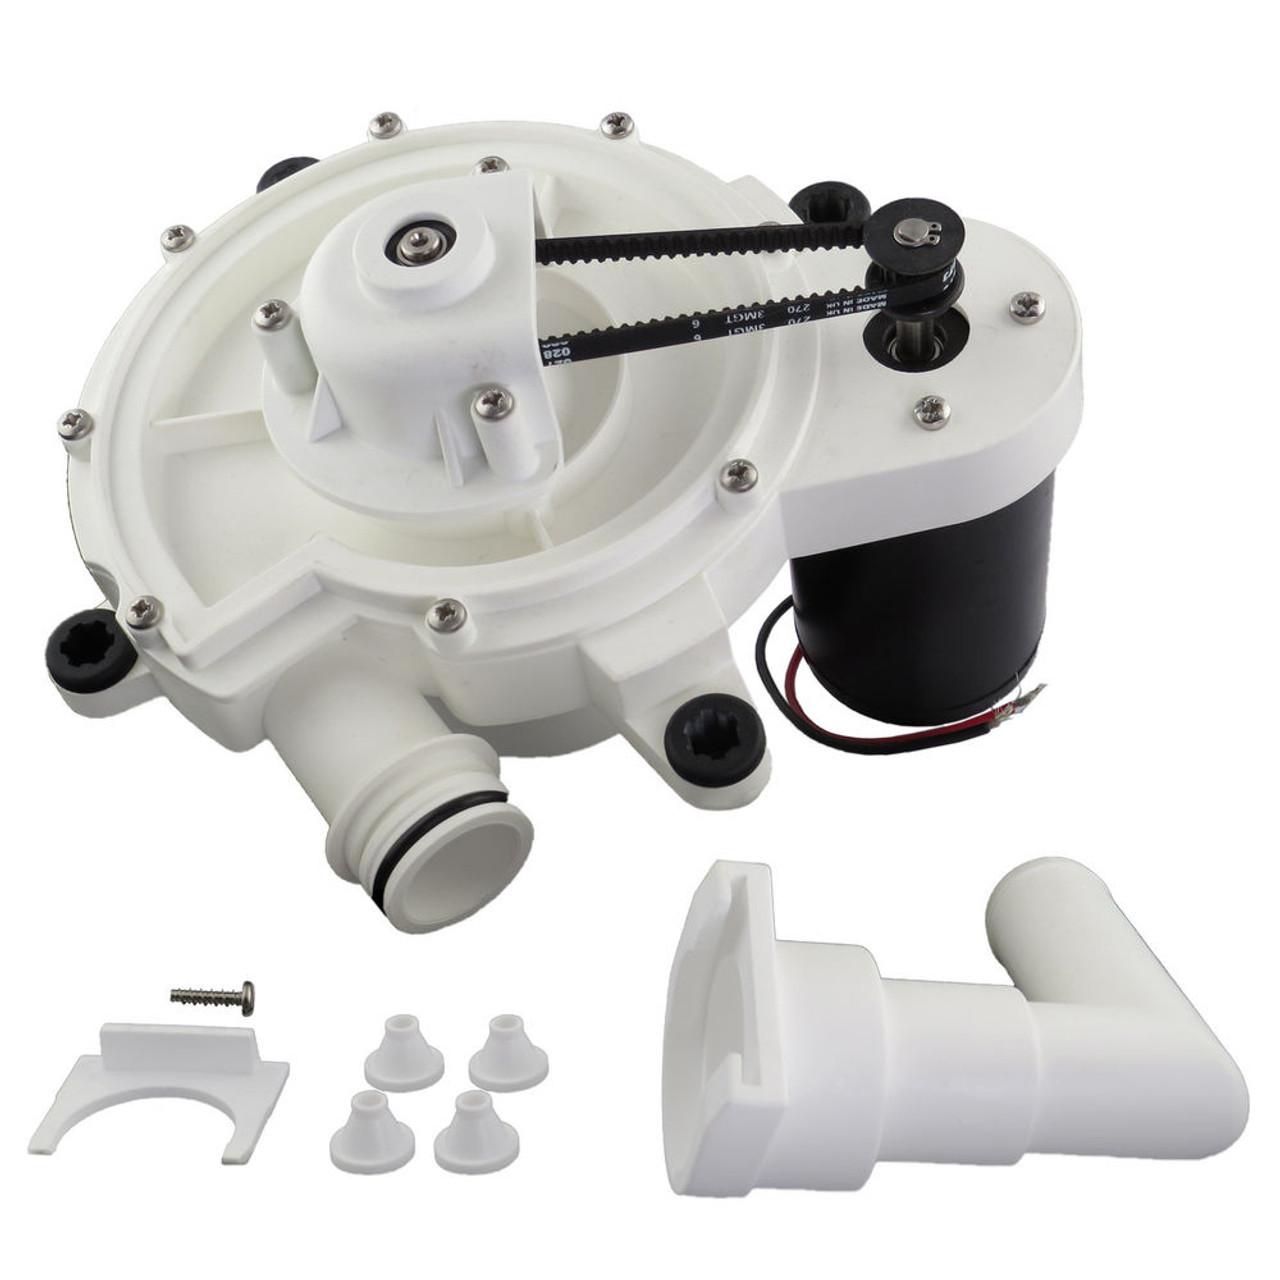 Jabsco Lite Flush Waste Pump Assembly